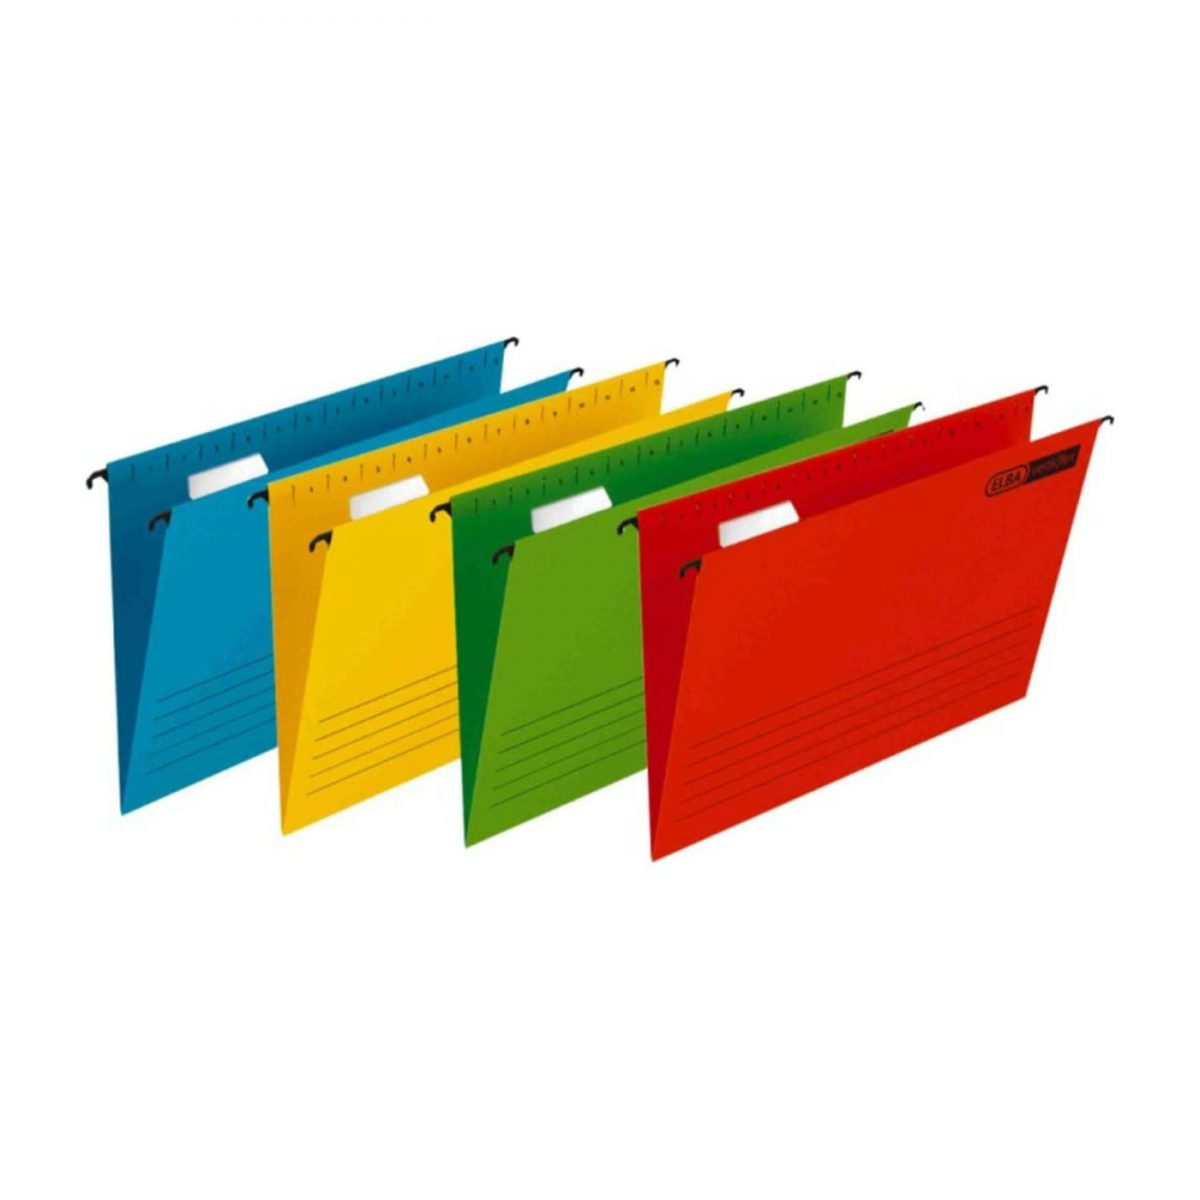 Dosar suspendabil cu eticheta, bagheta metalica, carton 230g/mp, 25 buc/cutie, Verticflex - galben